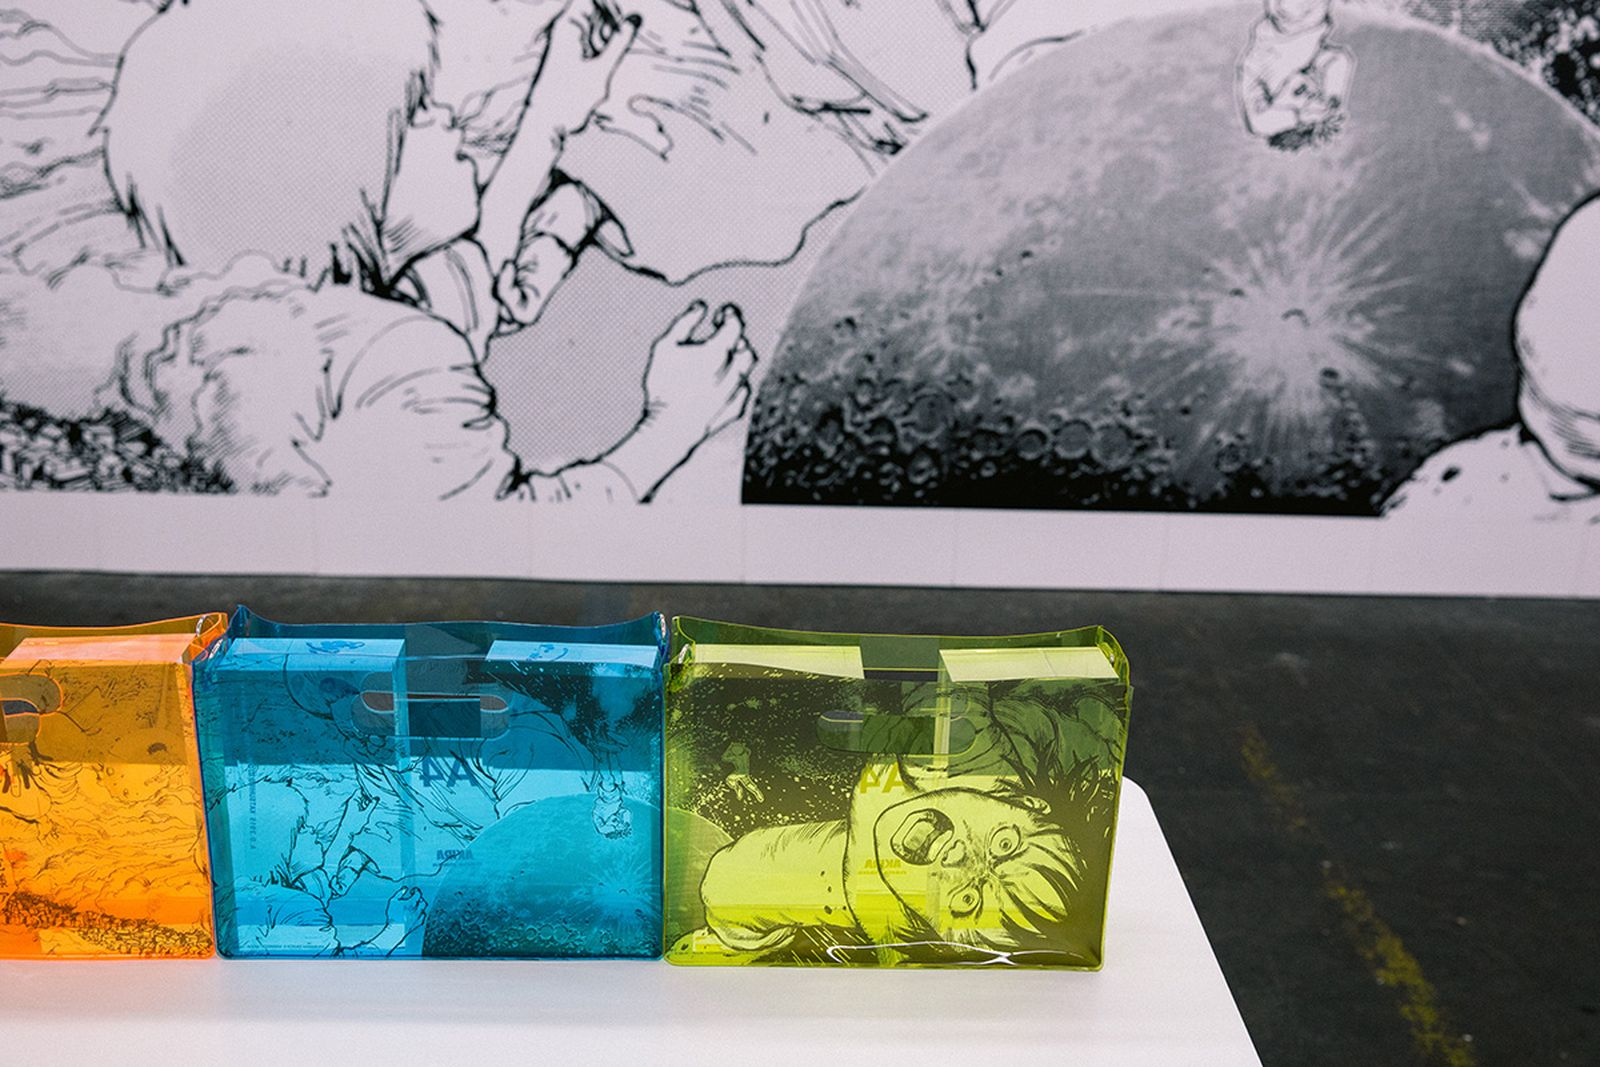 nana nana akira art wall kosuke kawamura exhibition nana-nana